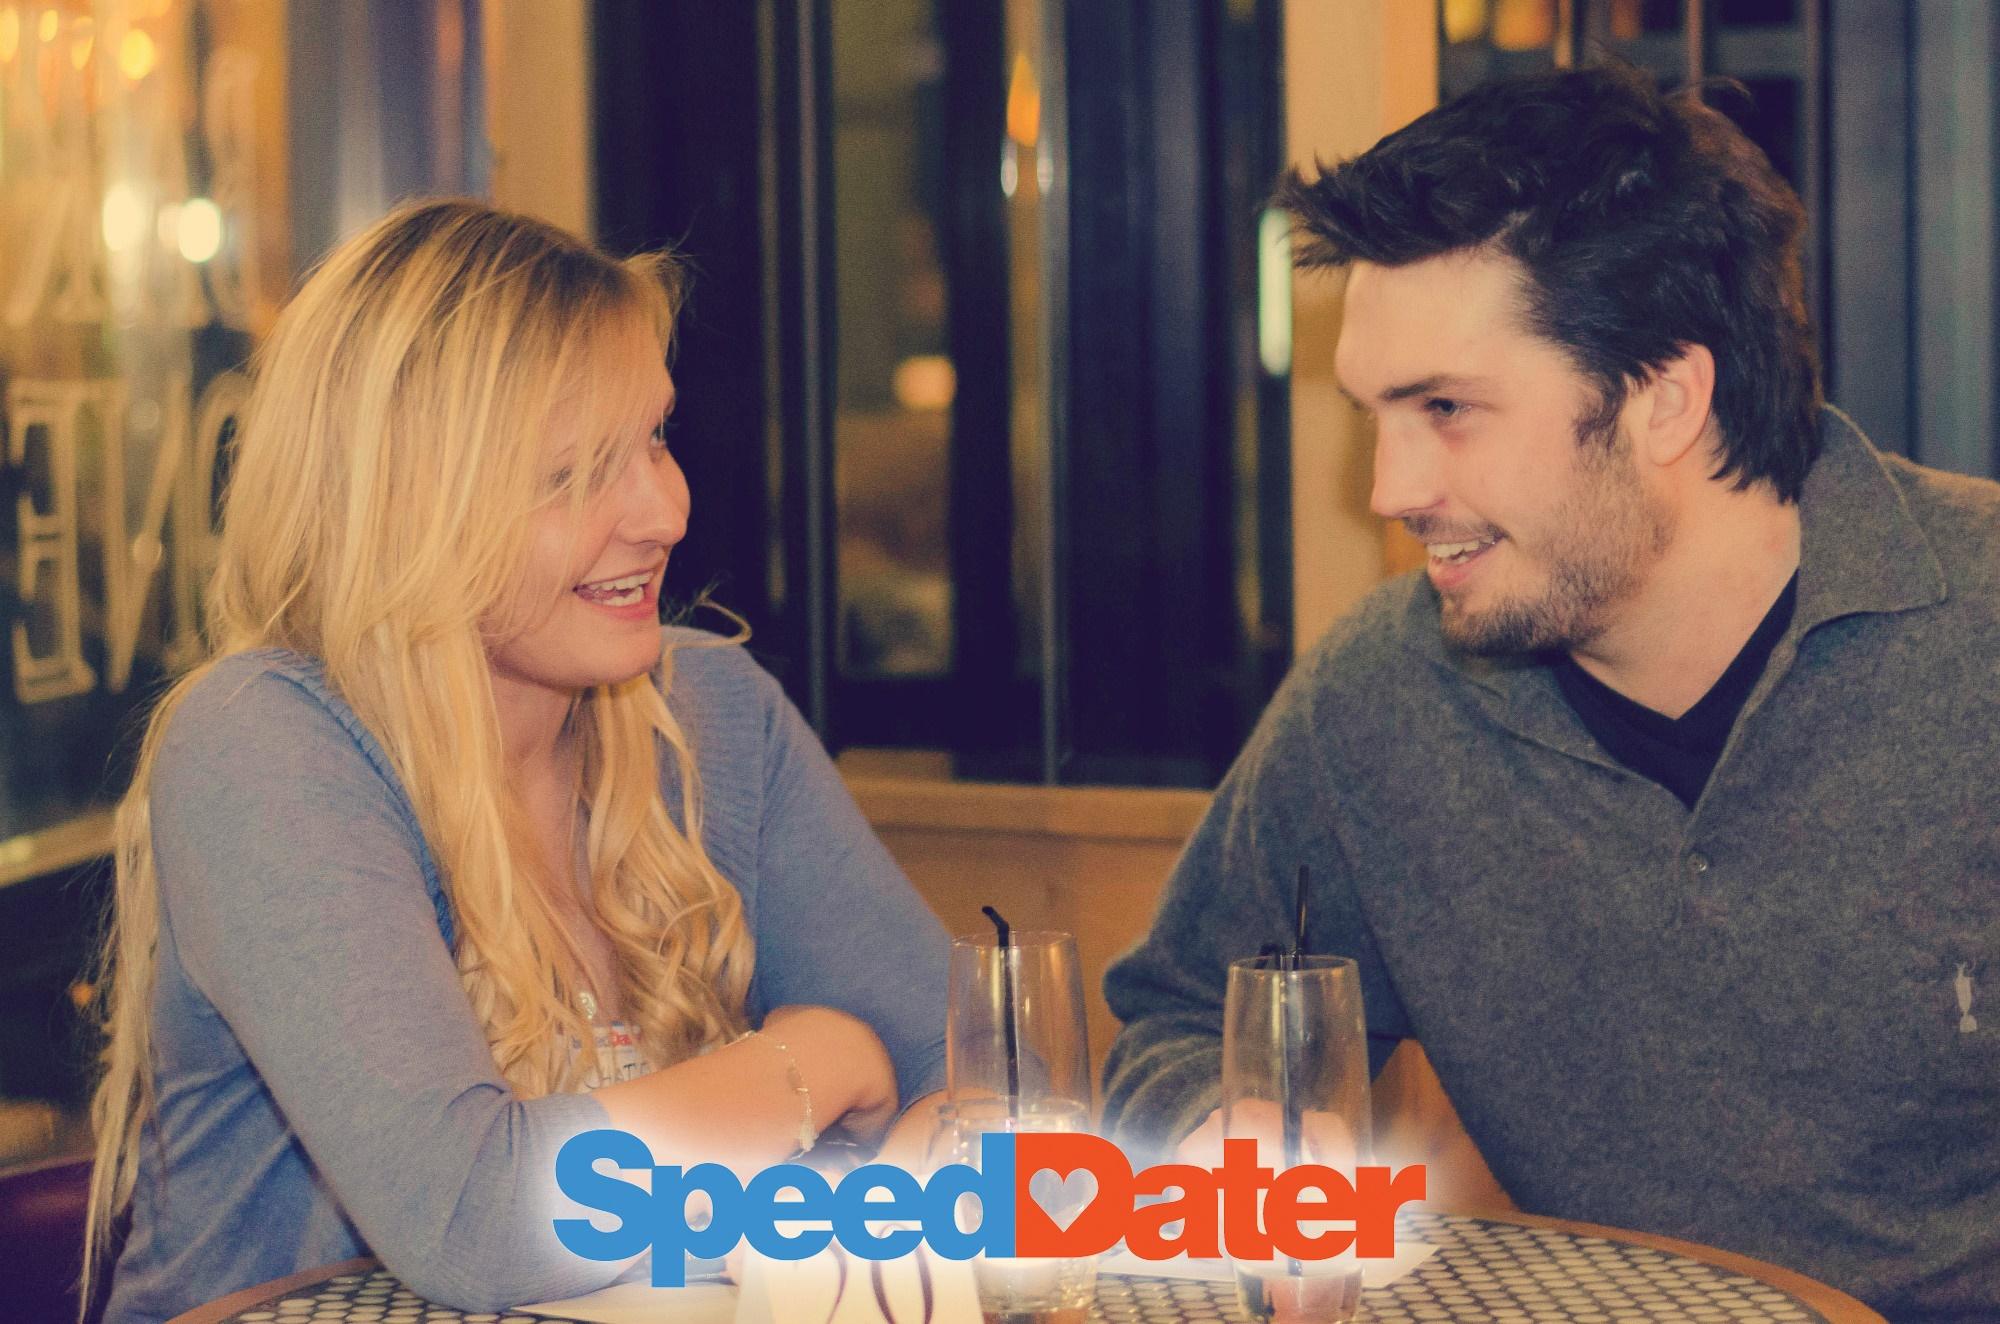 Fart dating Bristol